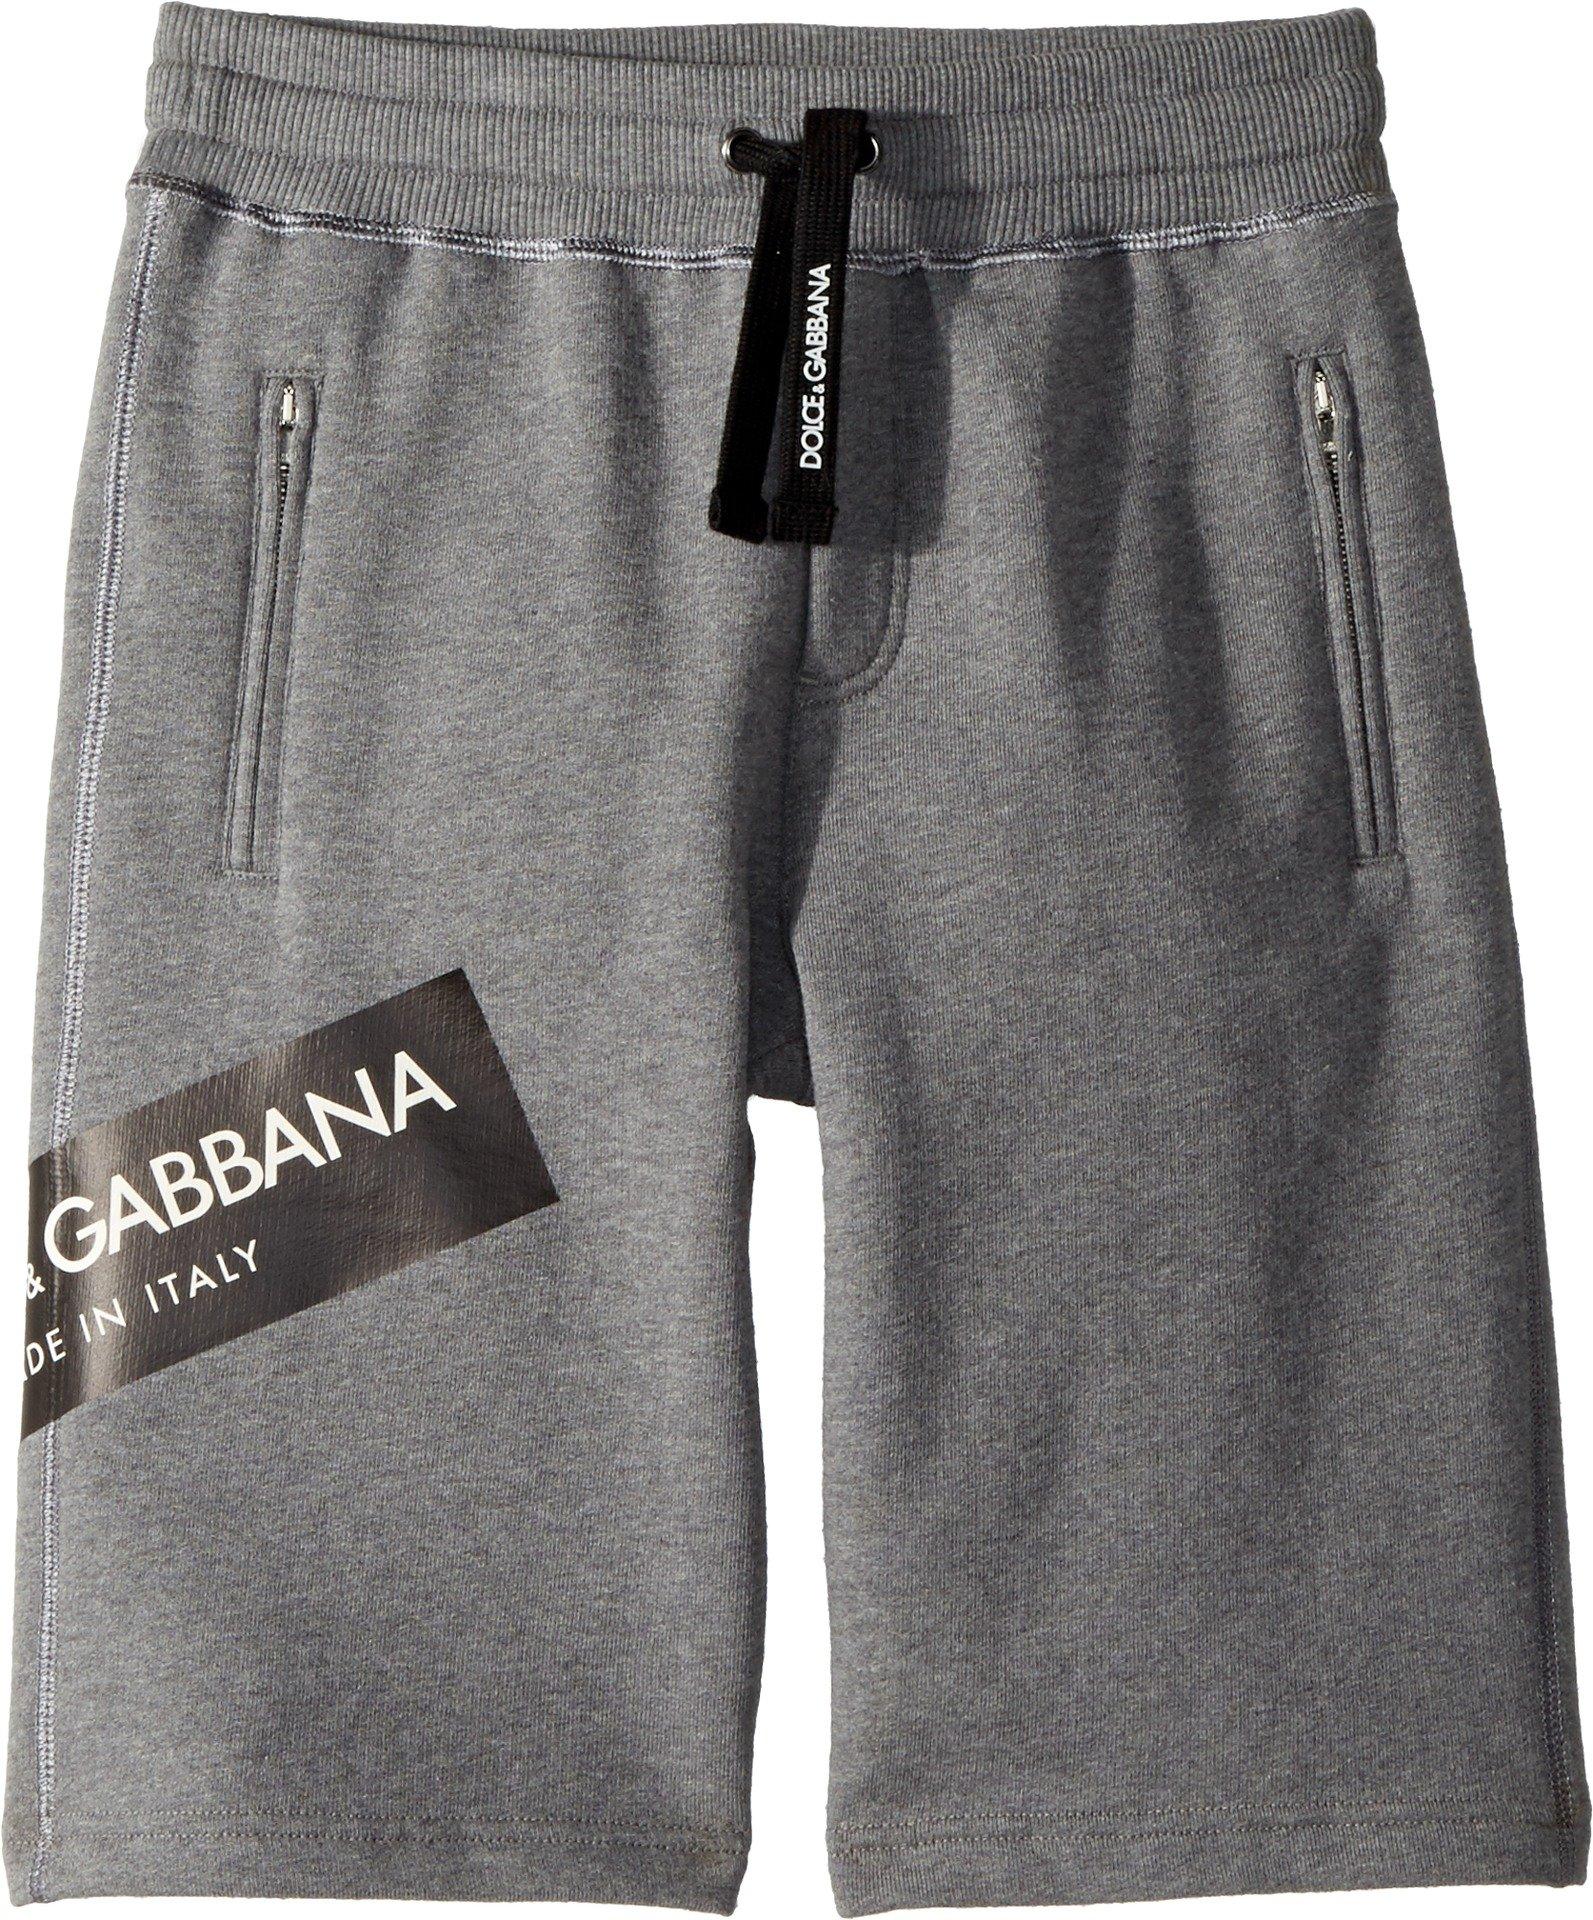 Dolce & Gabbana Kids Boy's Bermudas (Big Kids) Grey 10